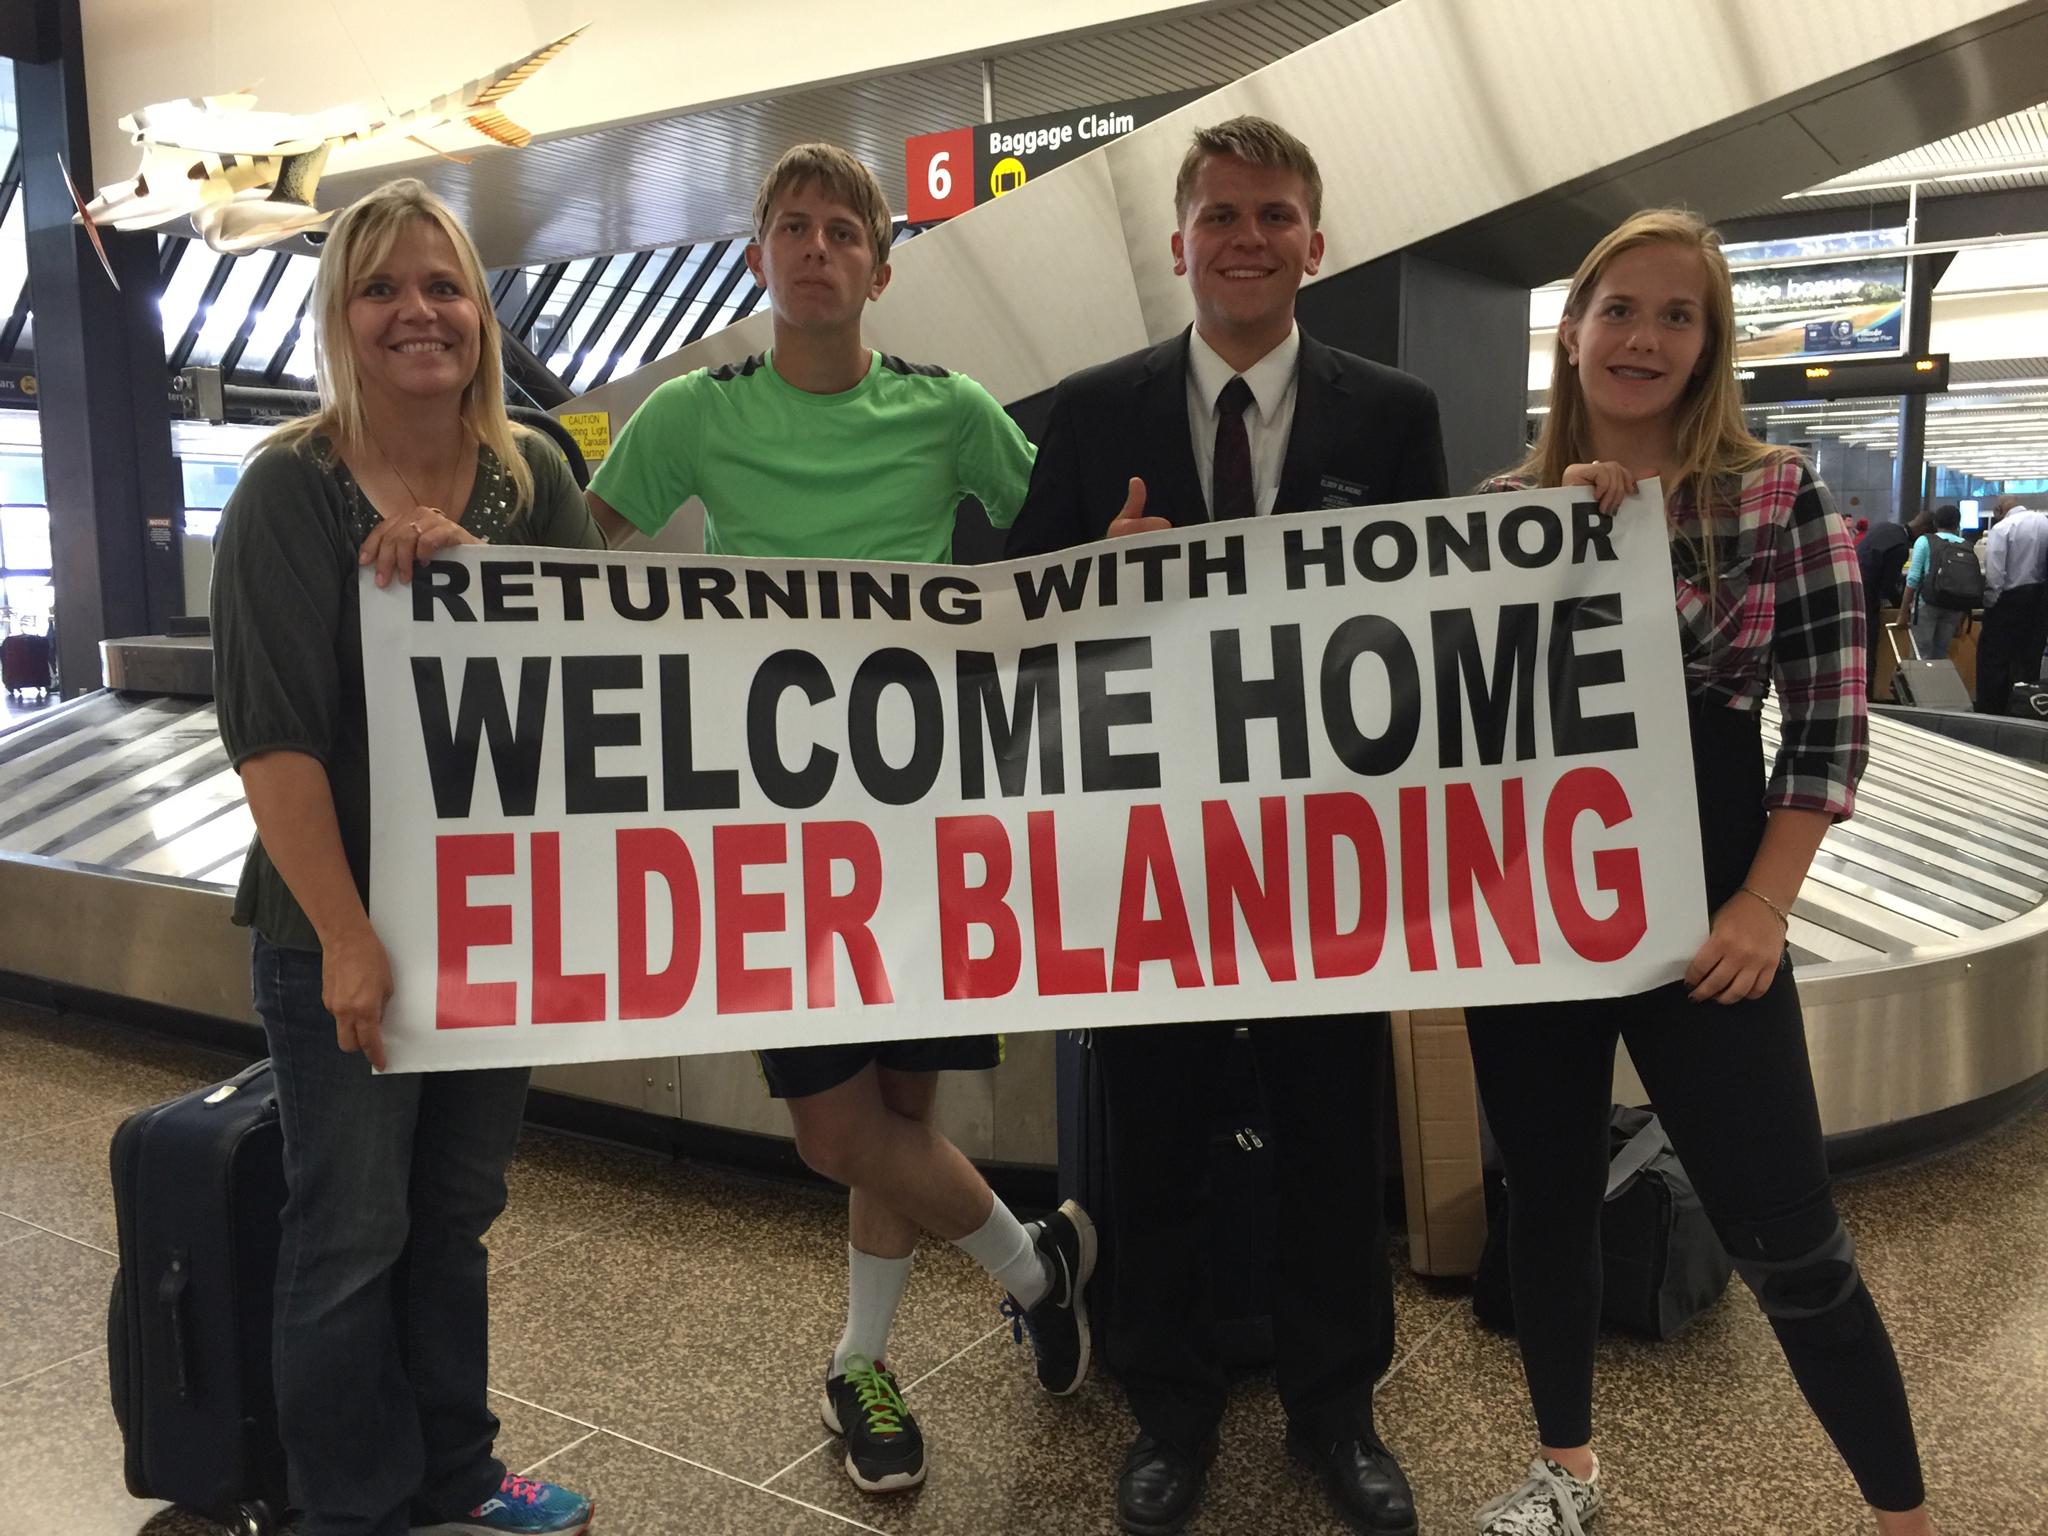 Doreen, Chris, Elder Michael Blanding, Jessie